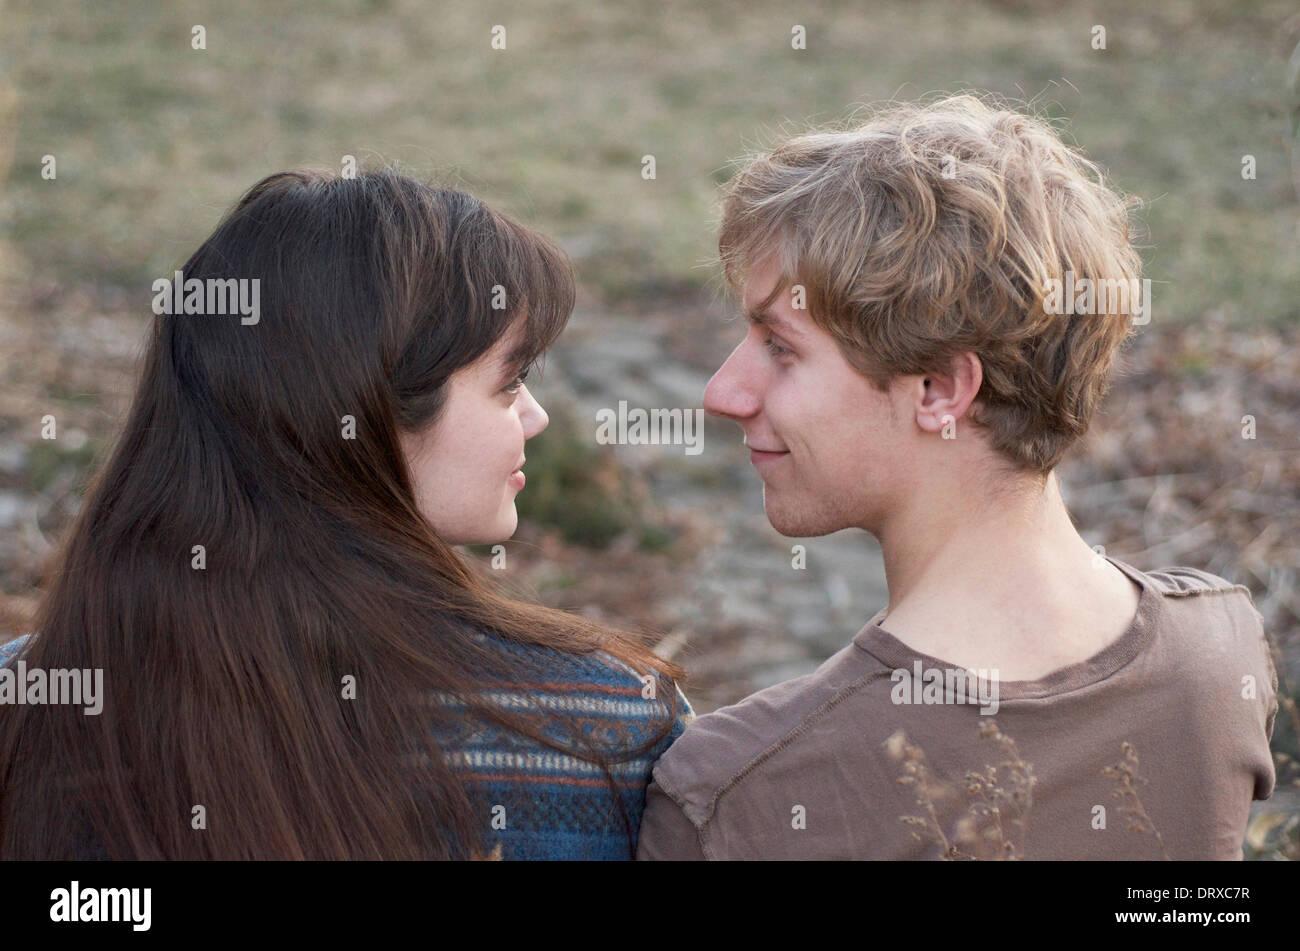 Girl et Guy dans l'amour, regarder endearingly. Photo Stock